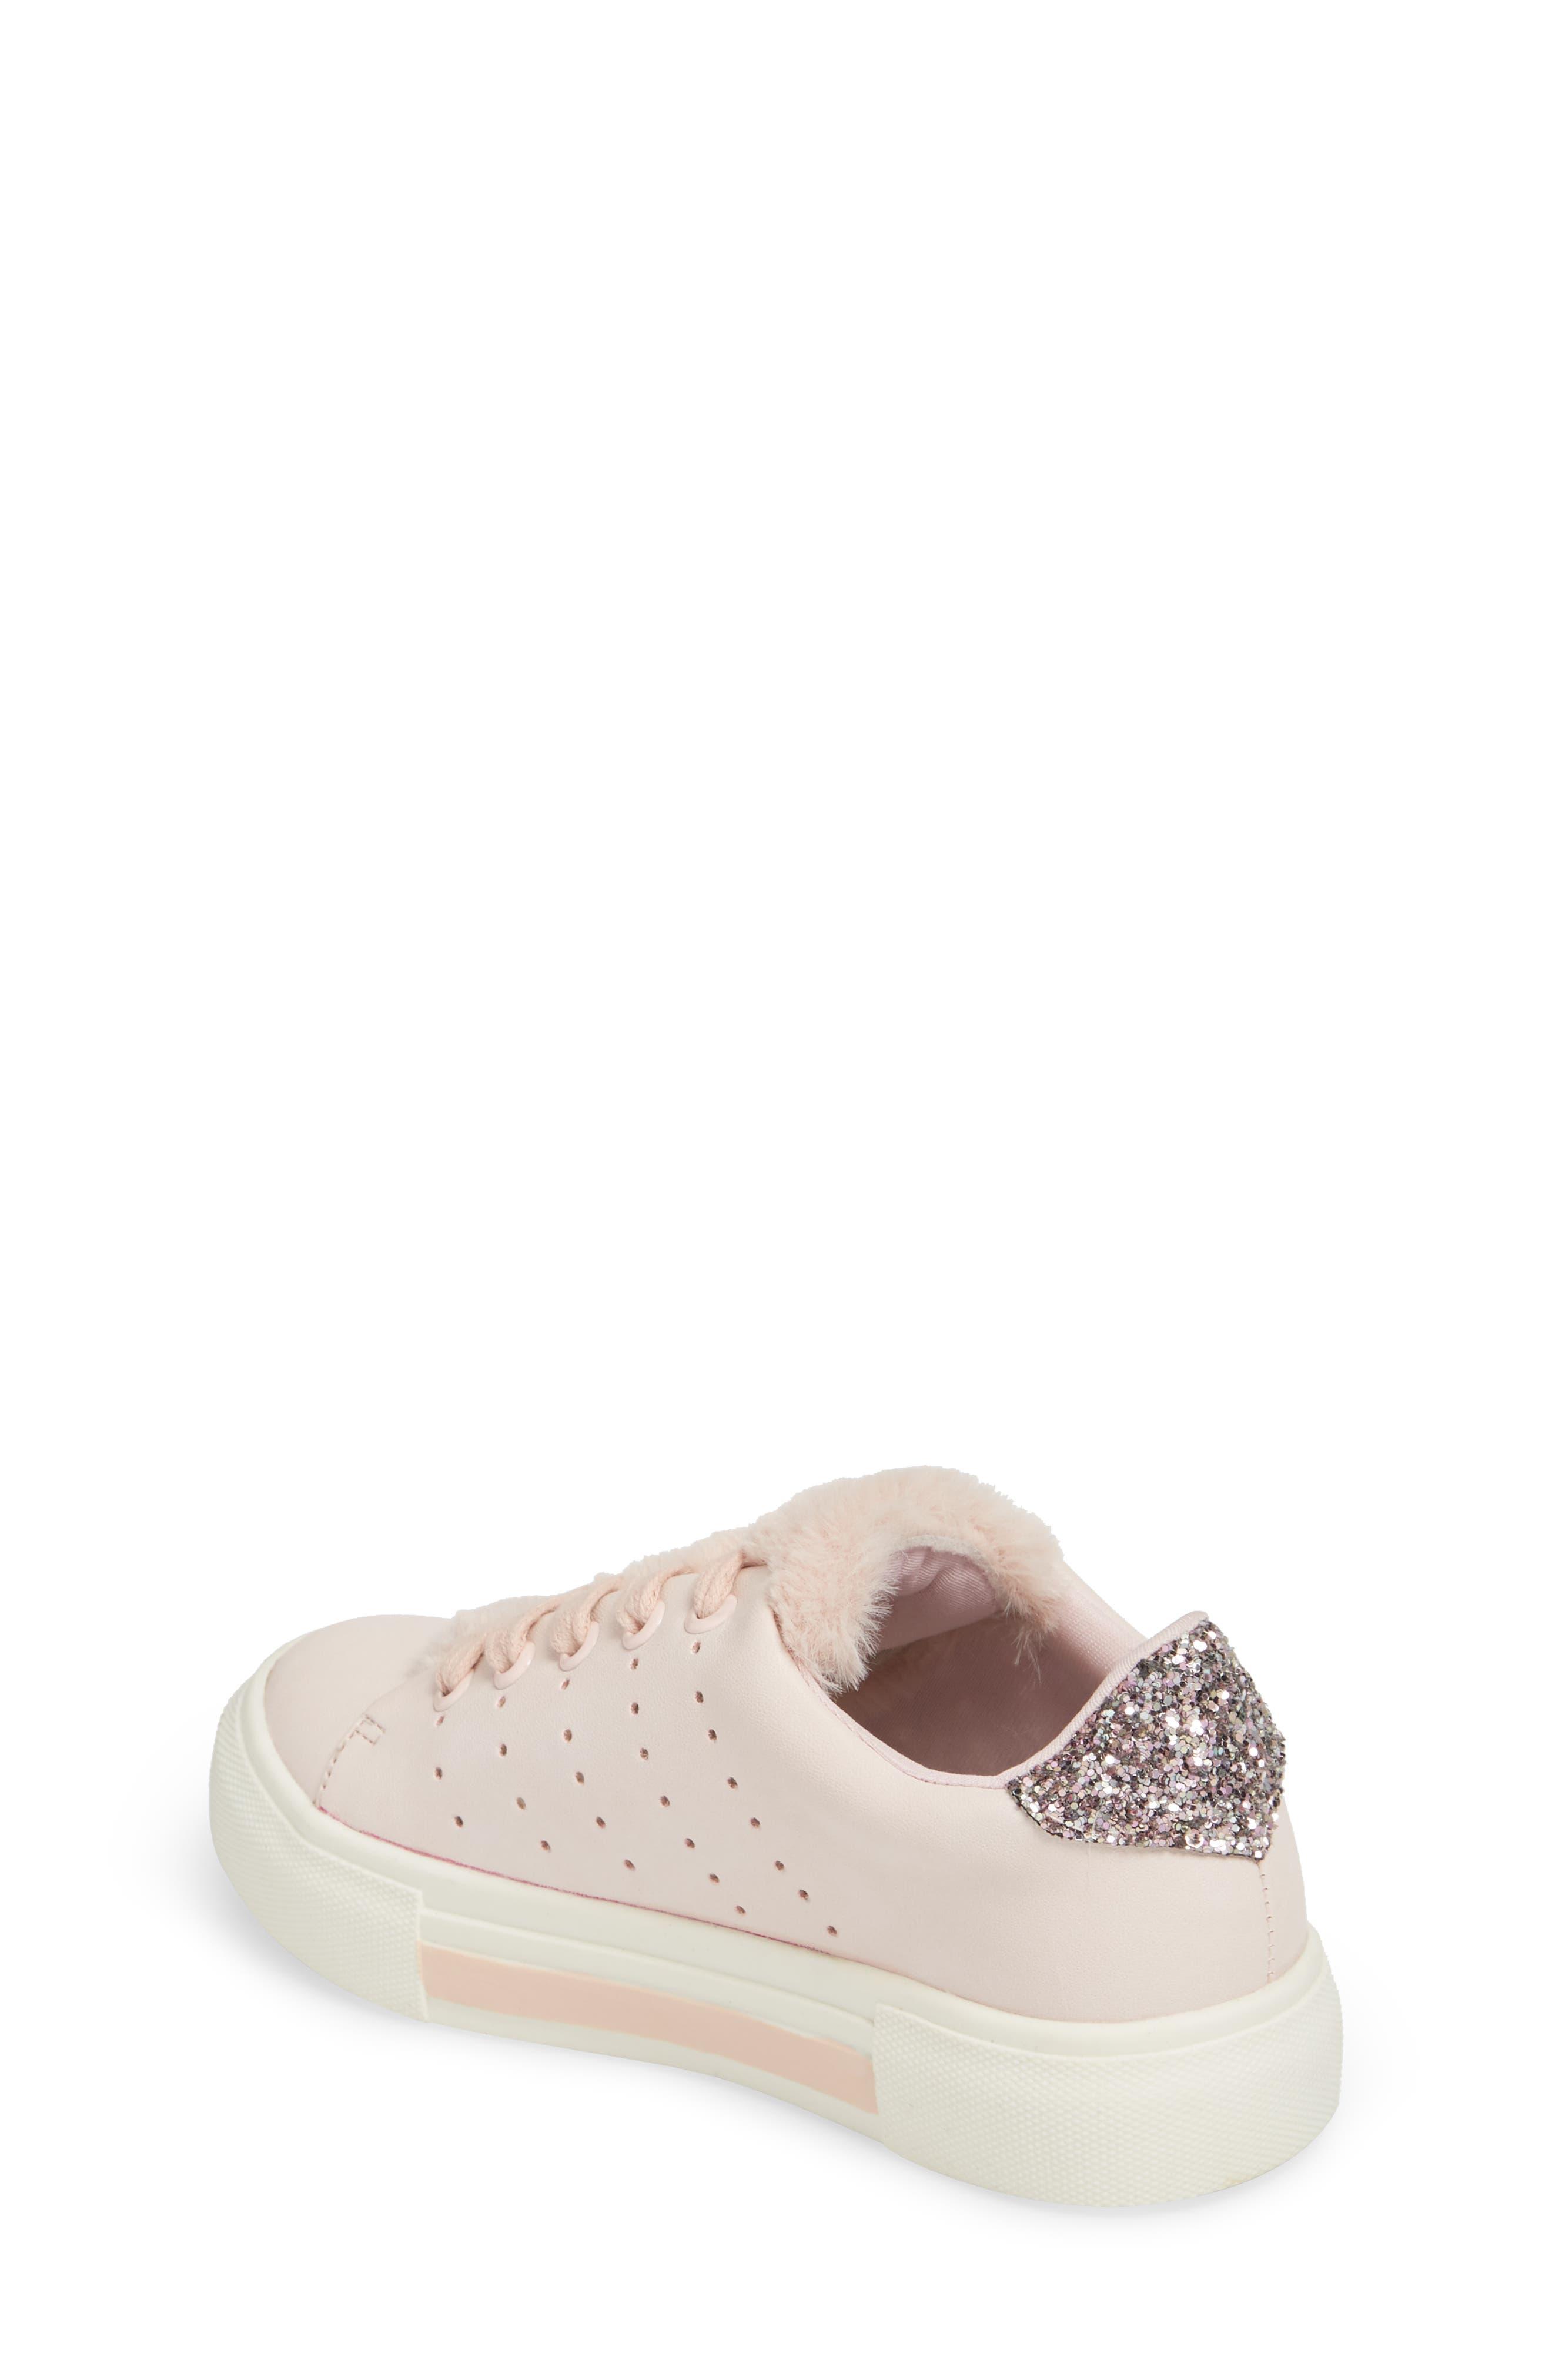 Cabel Glitter Faux Fur Sneaker,                             Alternate thumbnail 2, color,                             PINK